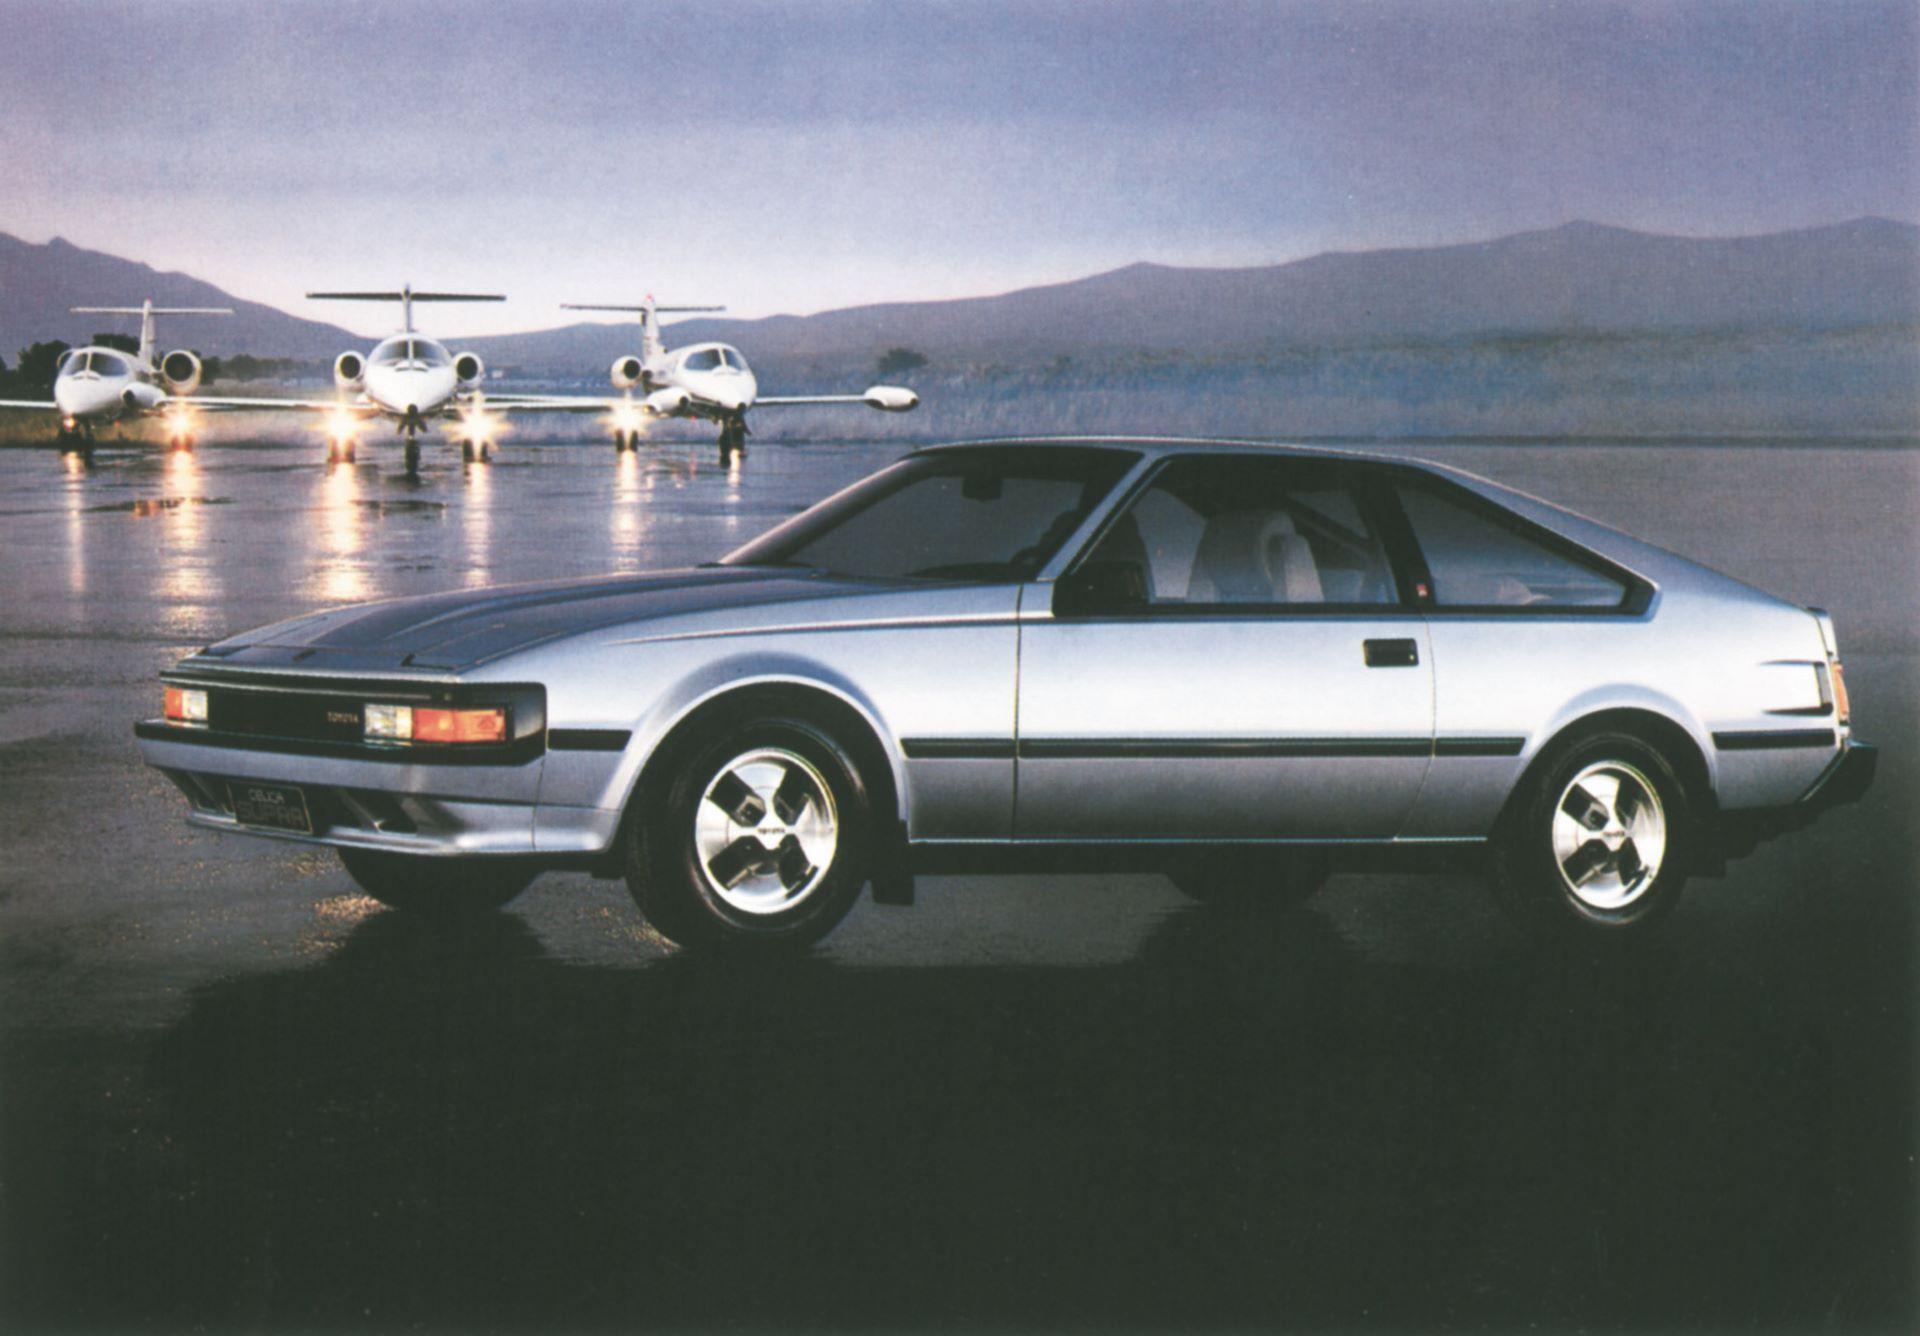 Toyota-Celica-50-years-26